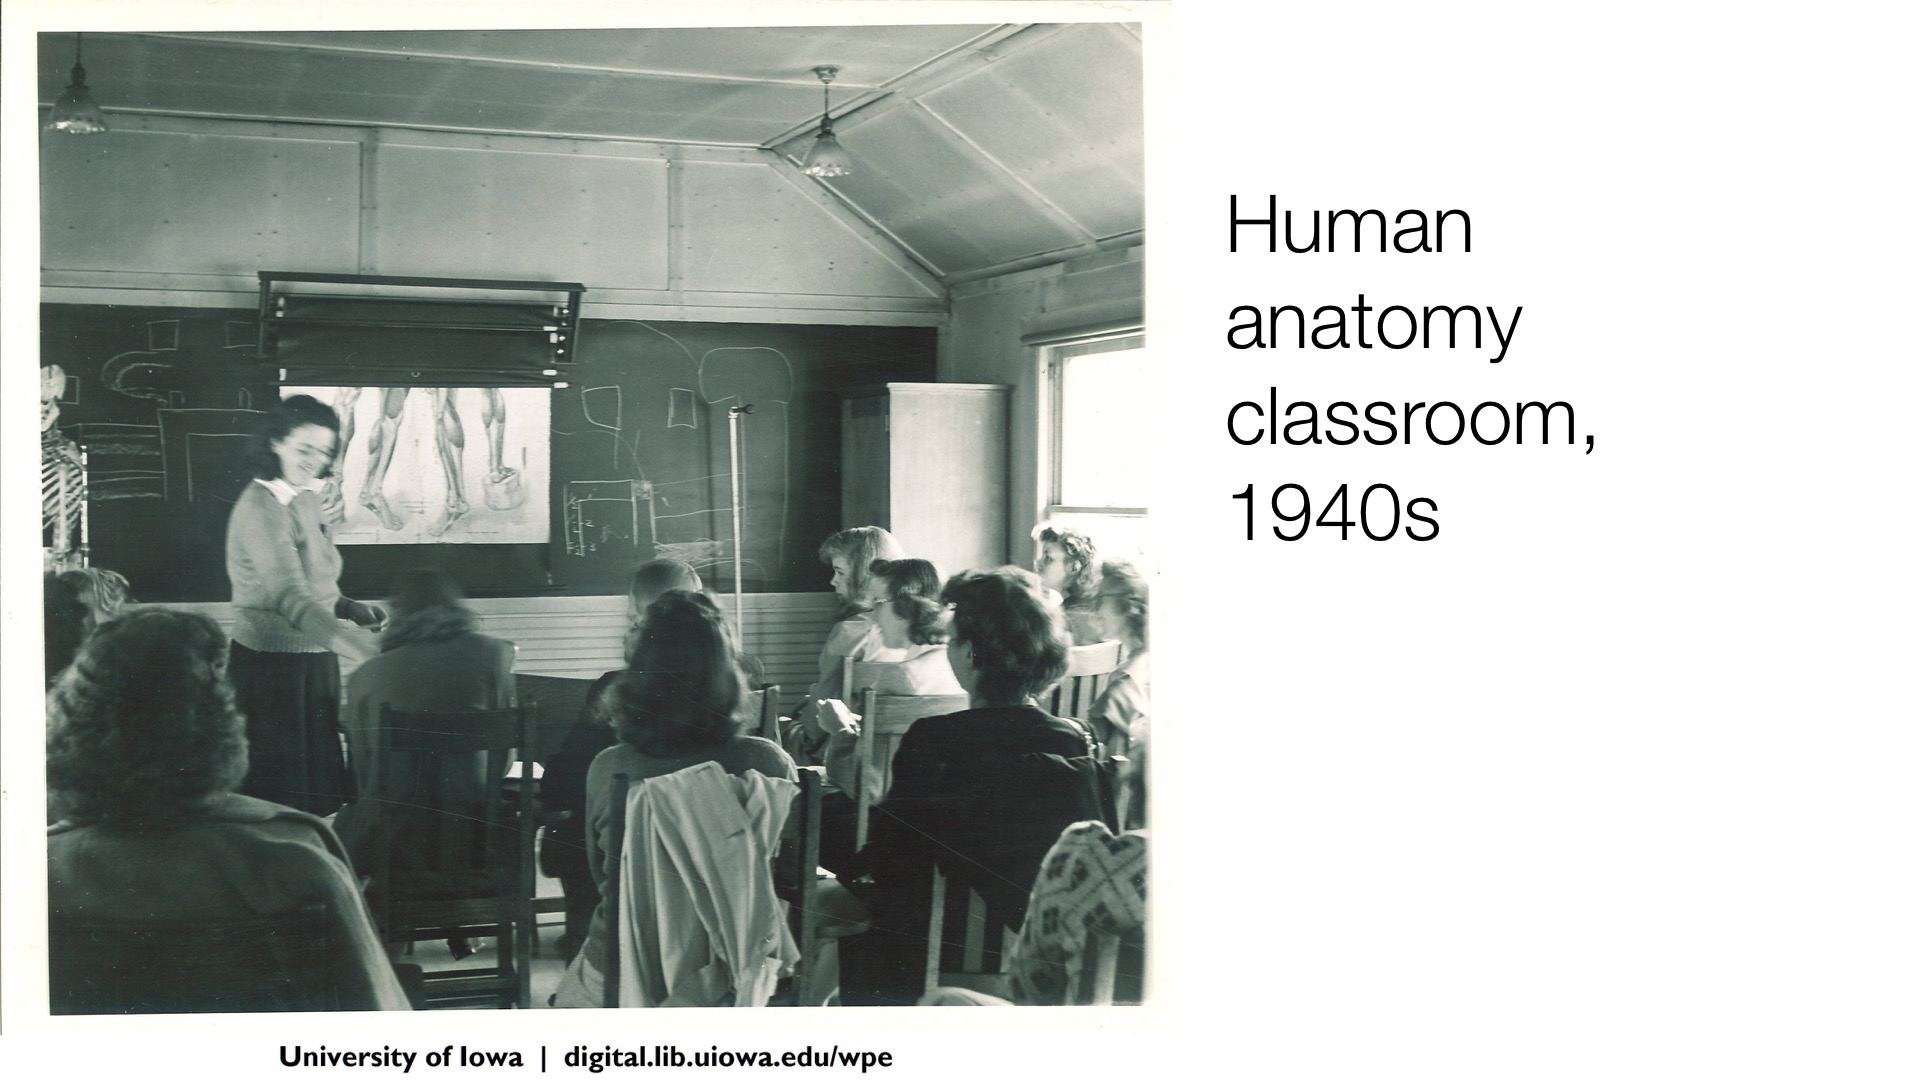 Human anatomy classroom, 1940s